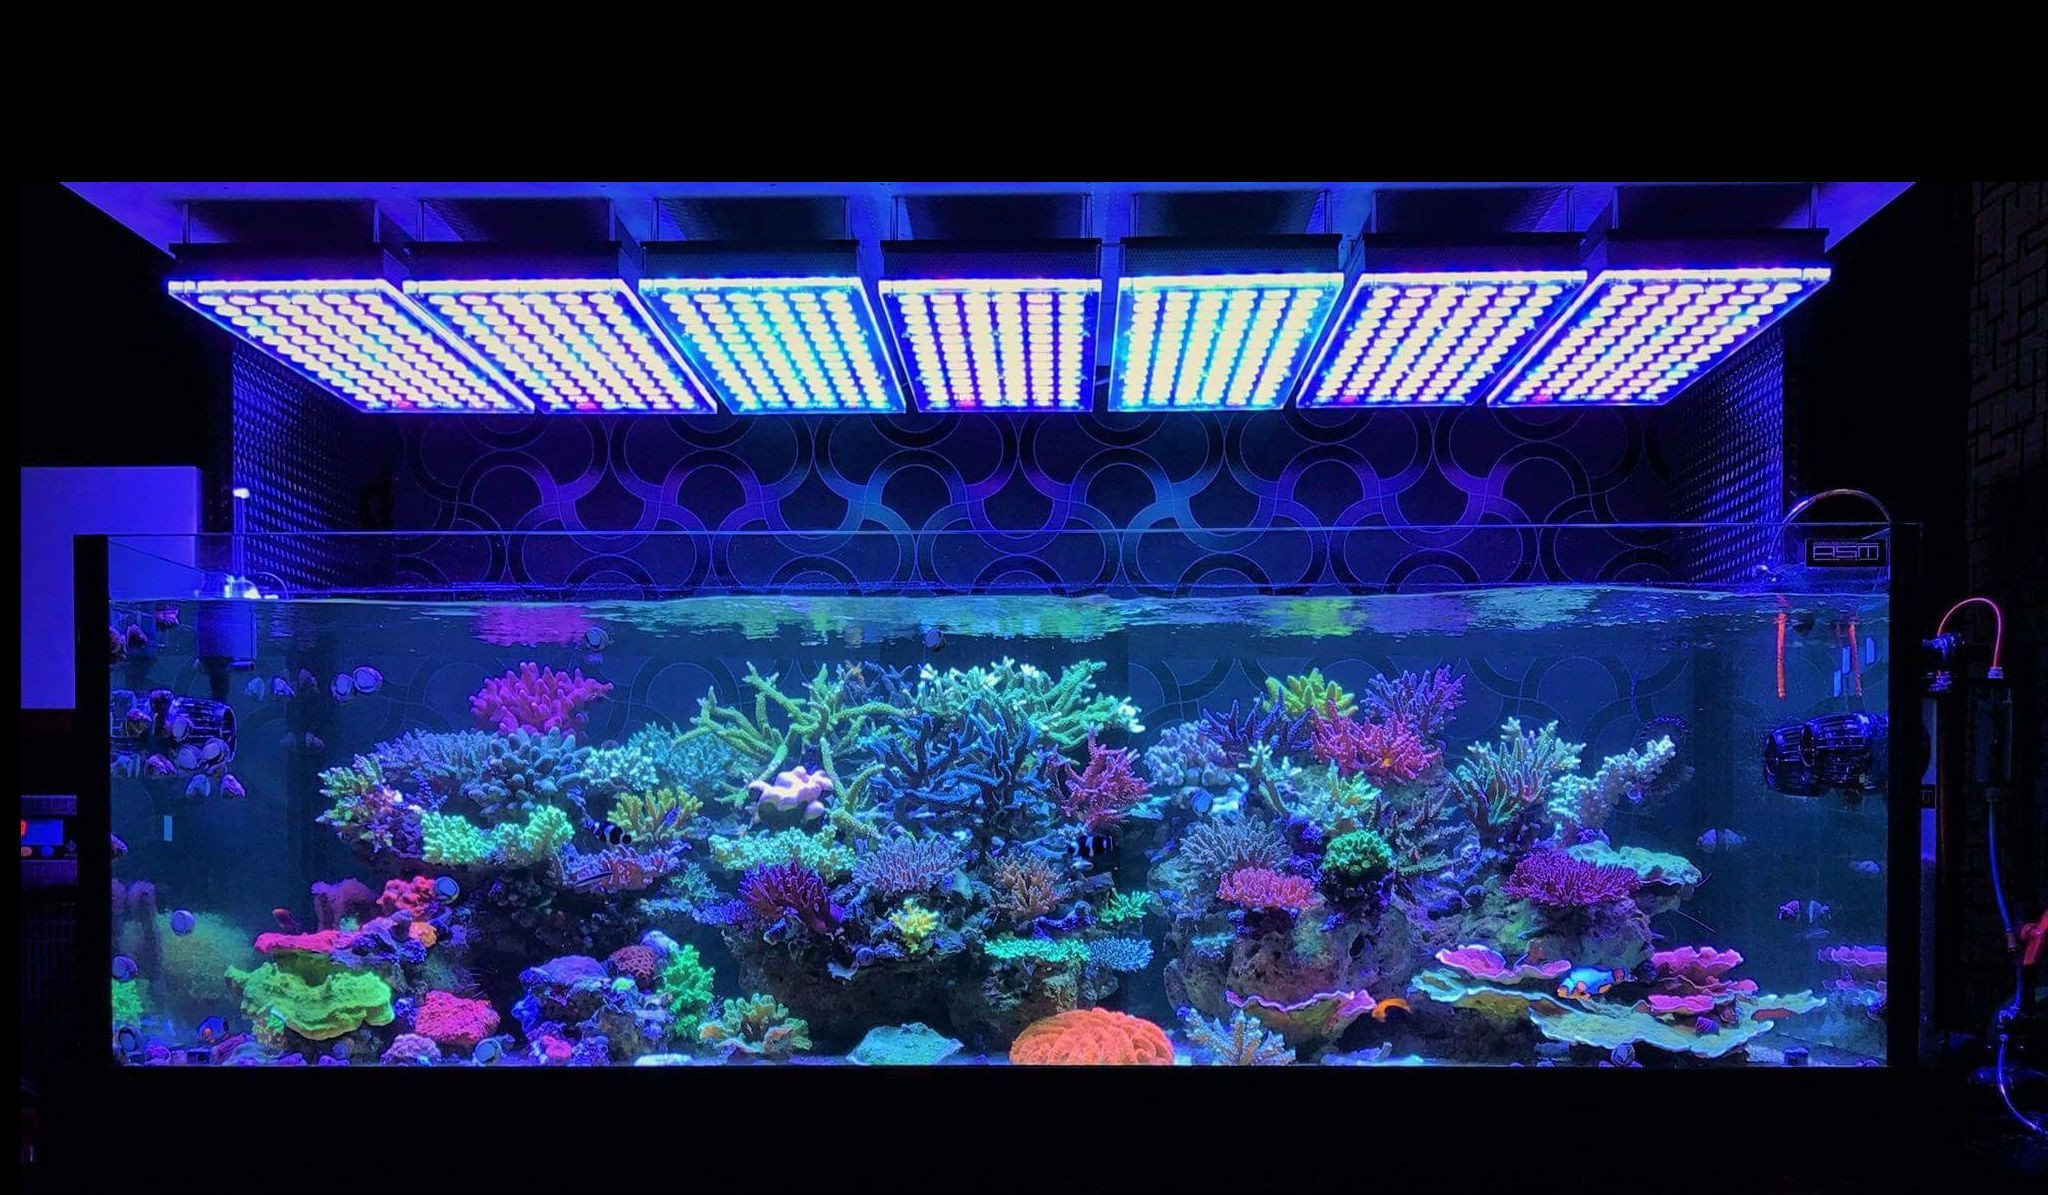 Best ideas about Led Aquarium Lights . Save or Pin Atlantik V4 Reef Aquarium LED lighting • Orphek Aquarium Now.